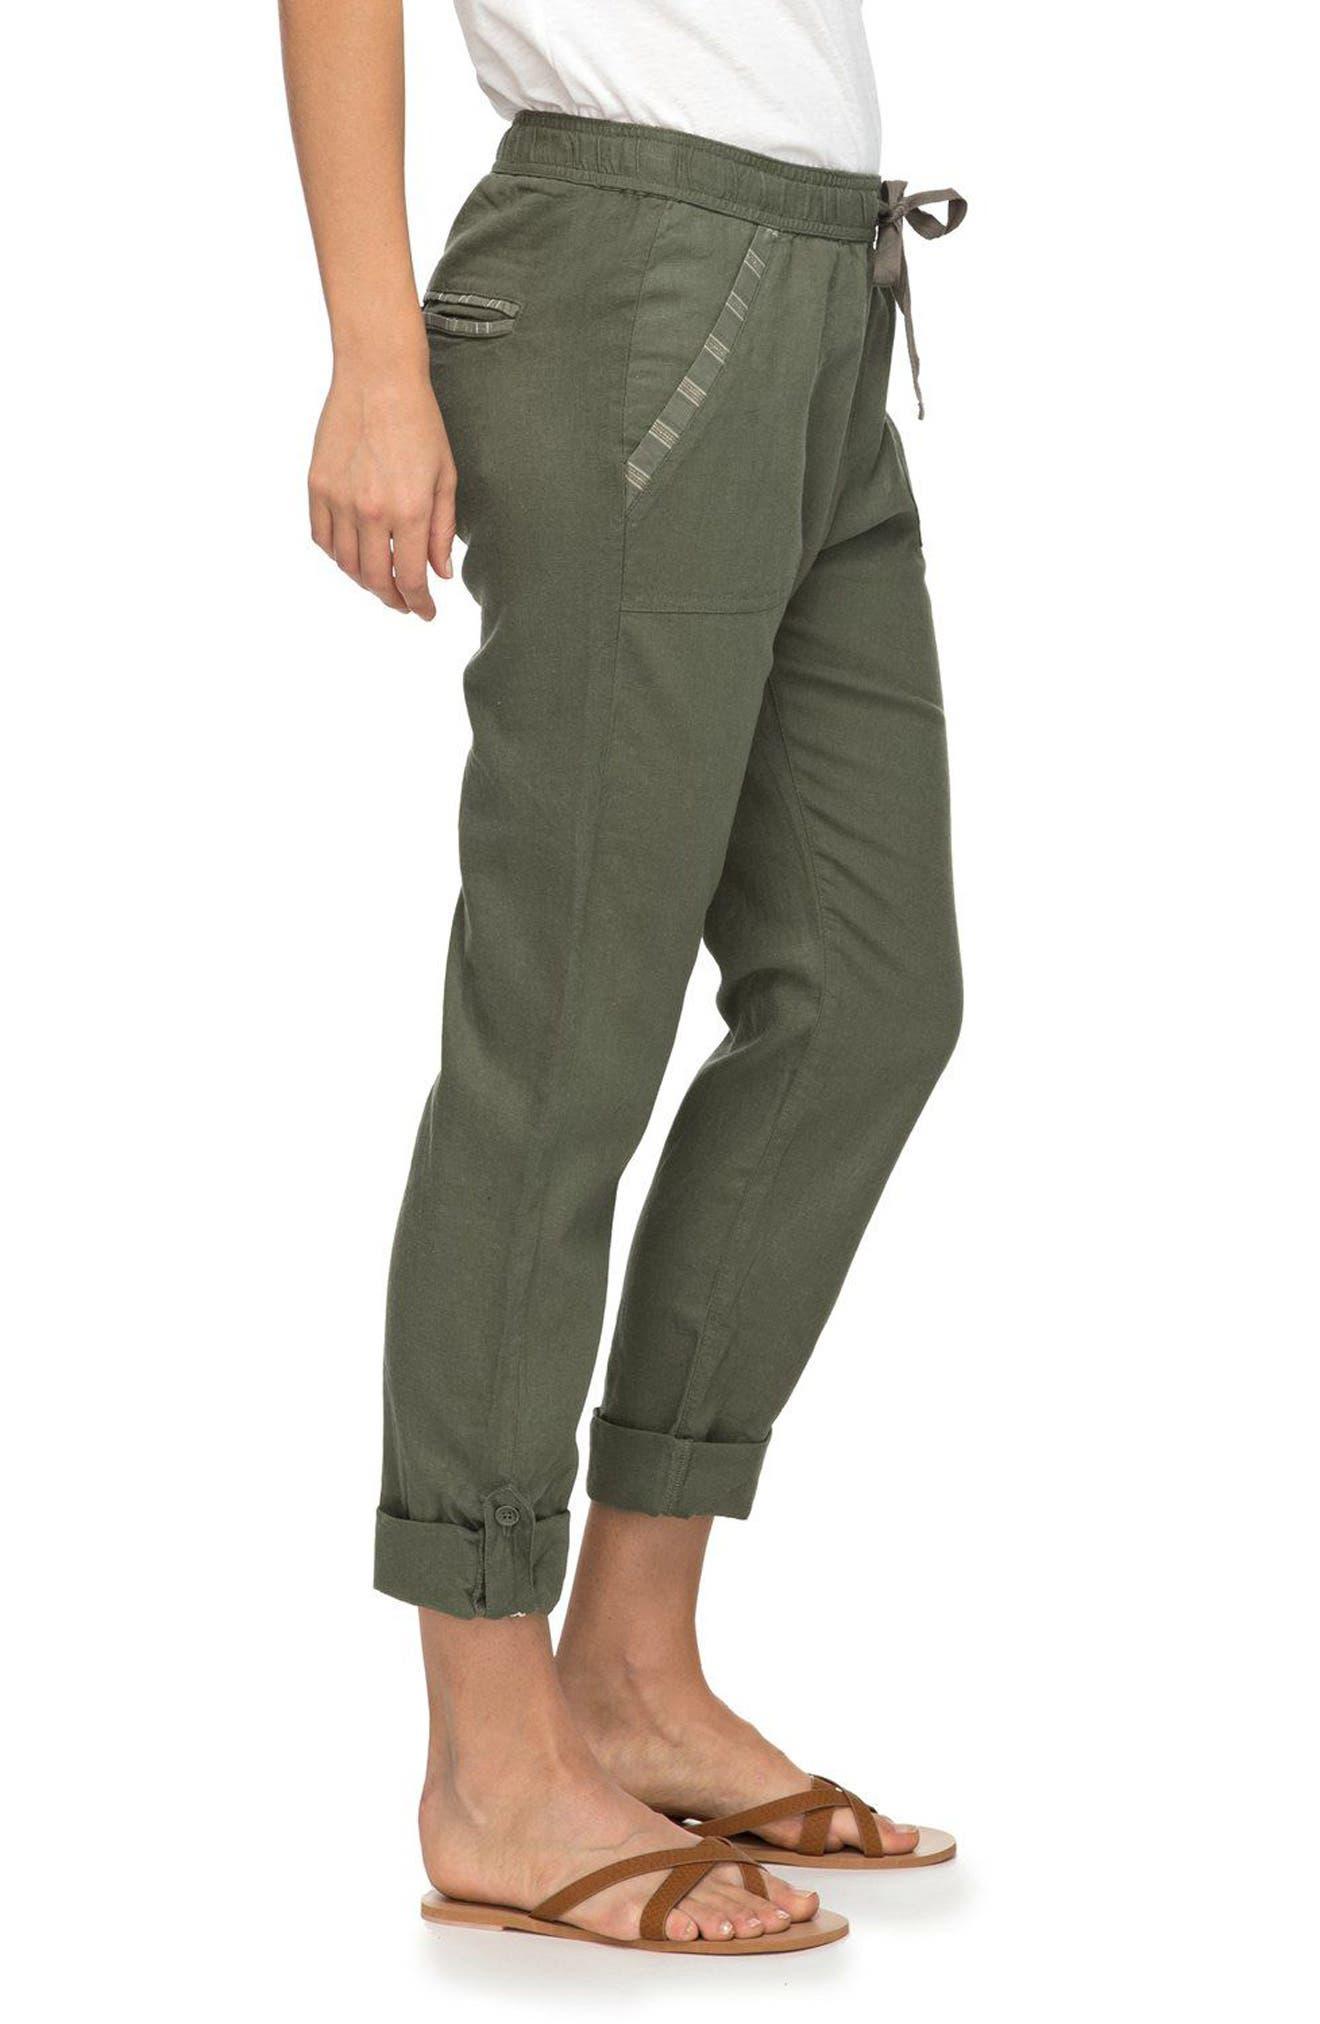 Symphony Lover Linen Blend Pants,                             Alternate thumbnail 4, color,                             Dusty Olive